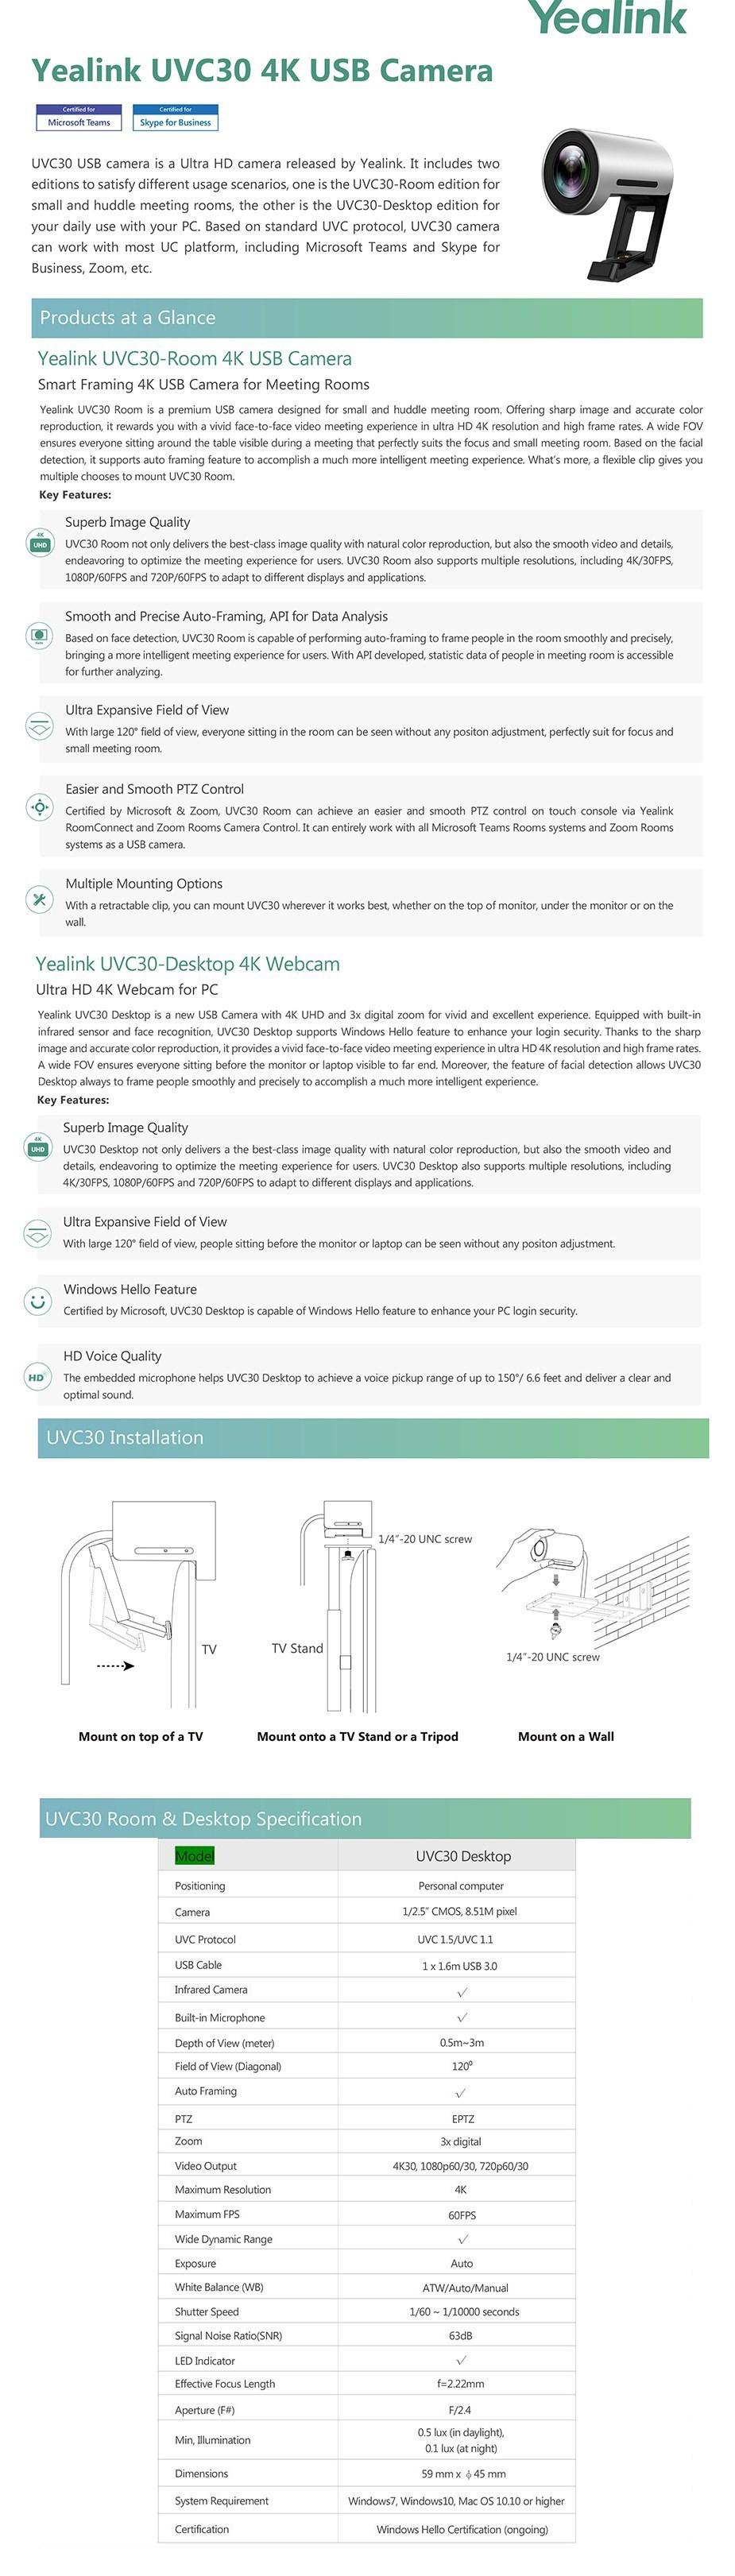 yealink-uvc30-4k-usb-webcam-for-pc-built-in-mic-ac43185-1.jpg